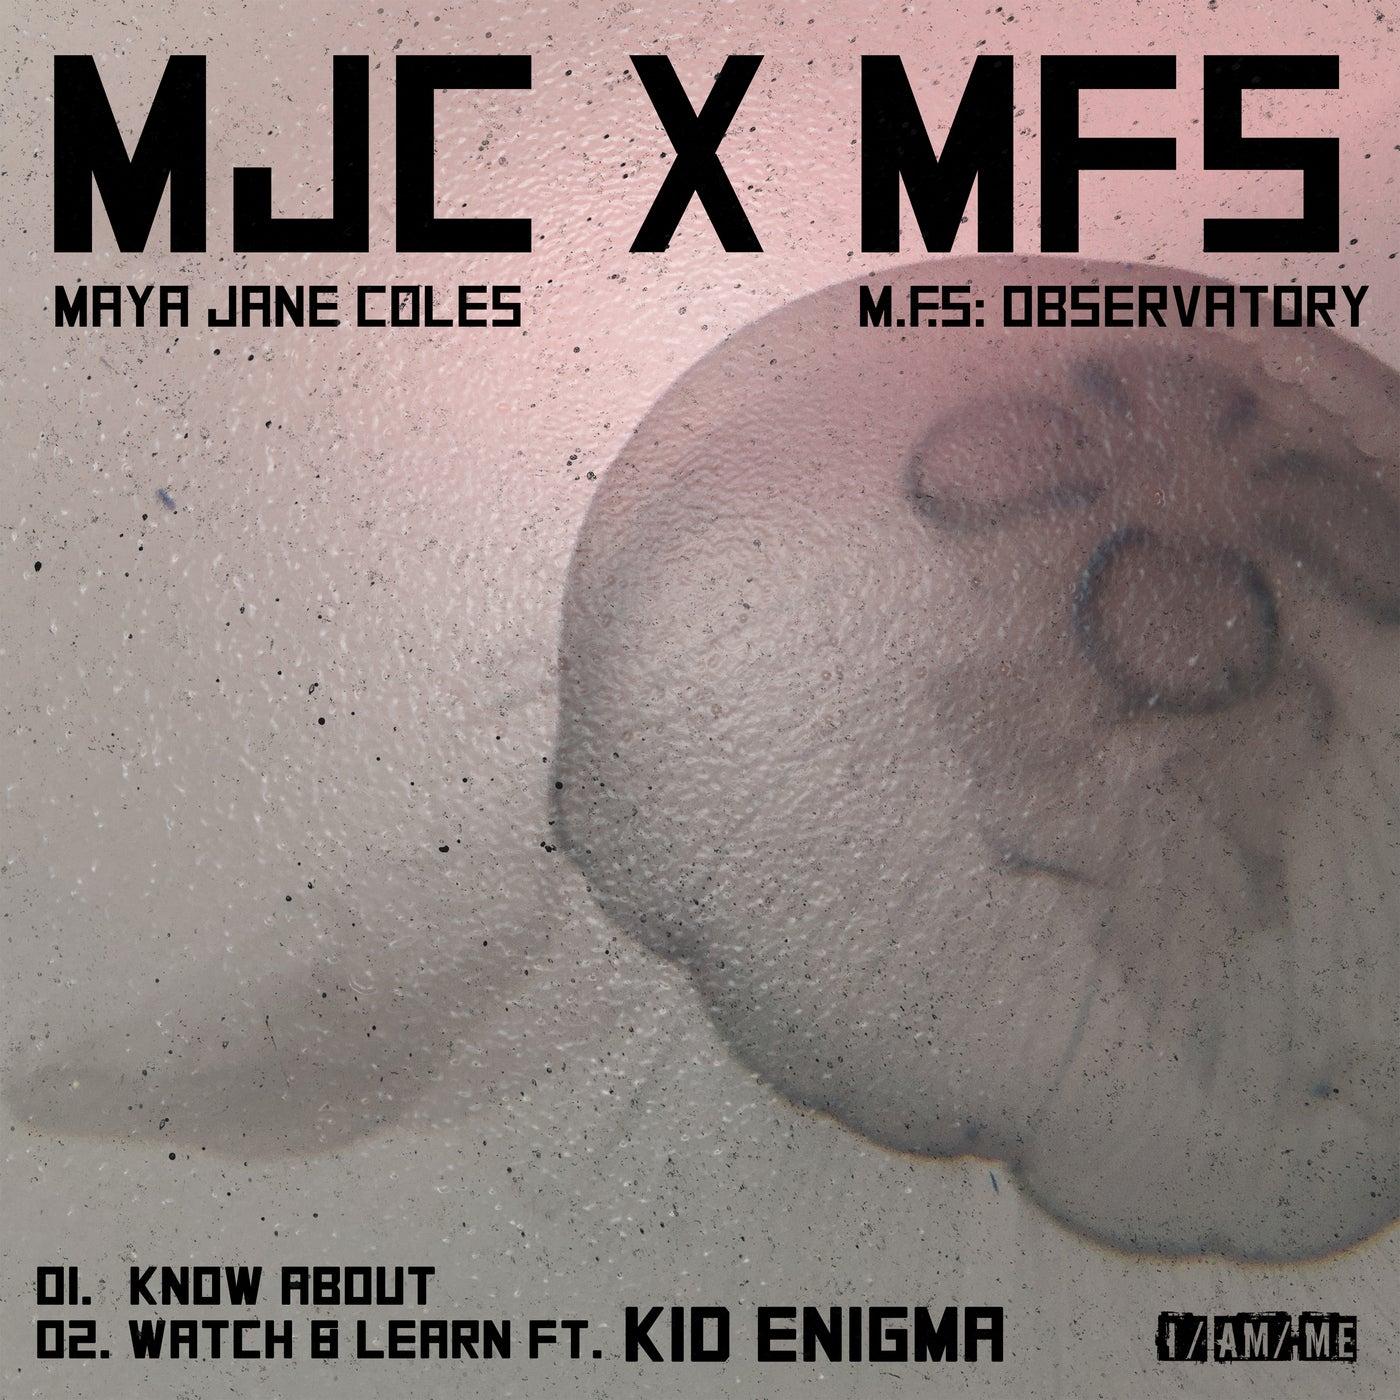 M.F.S: Observatory music download - Beatport